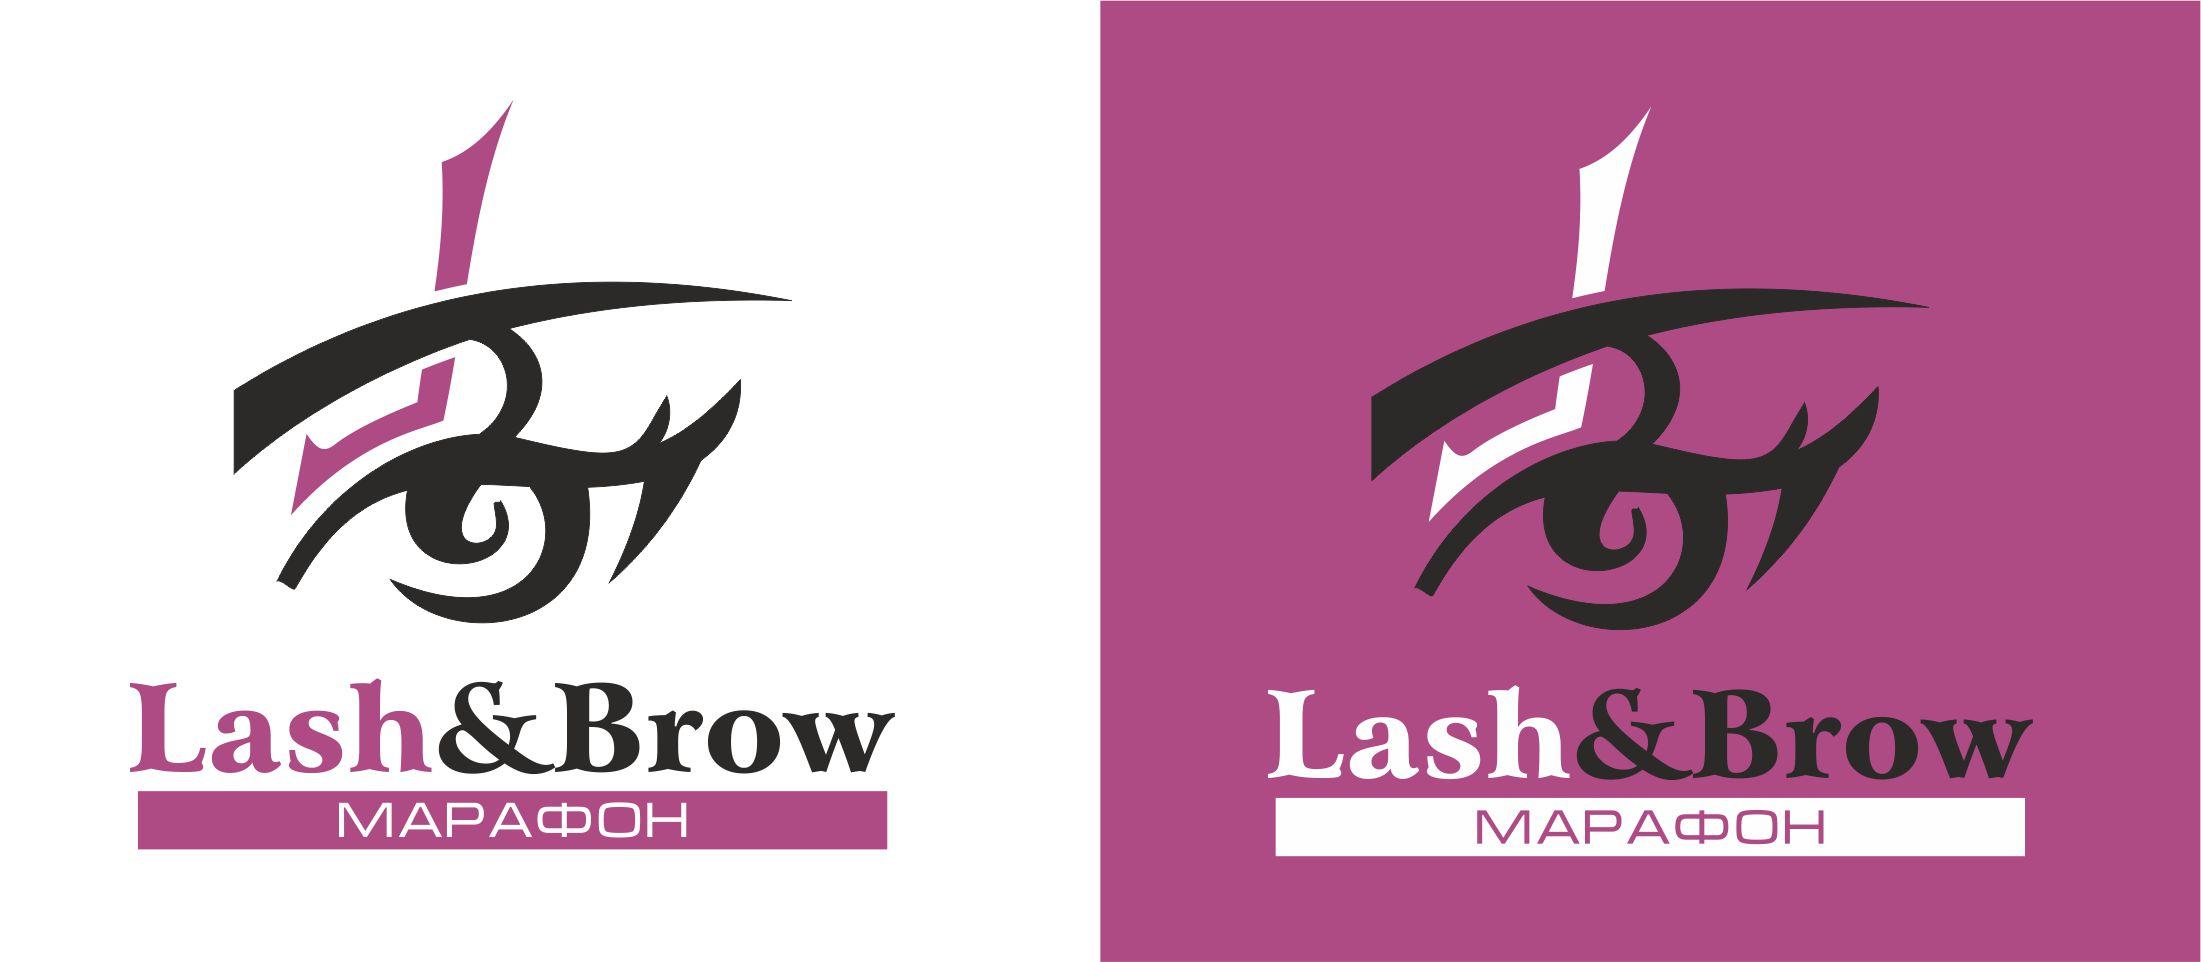 "Создание логотипа мероприятия ""Марафон Lash&Brow"" фото f_89158f9061def0f8.jpg"